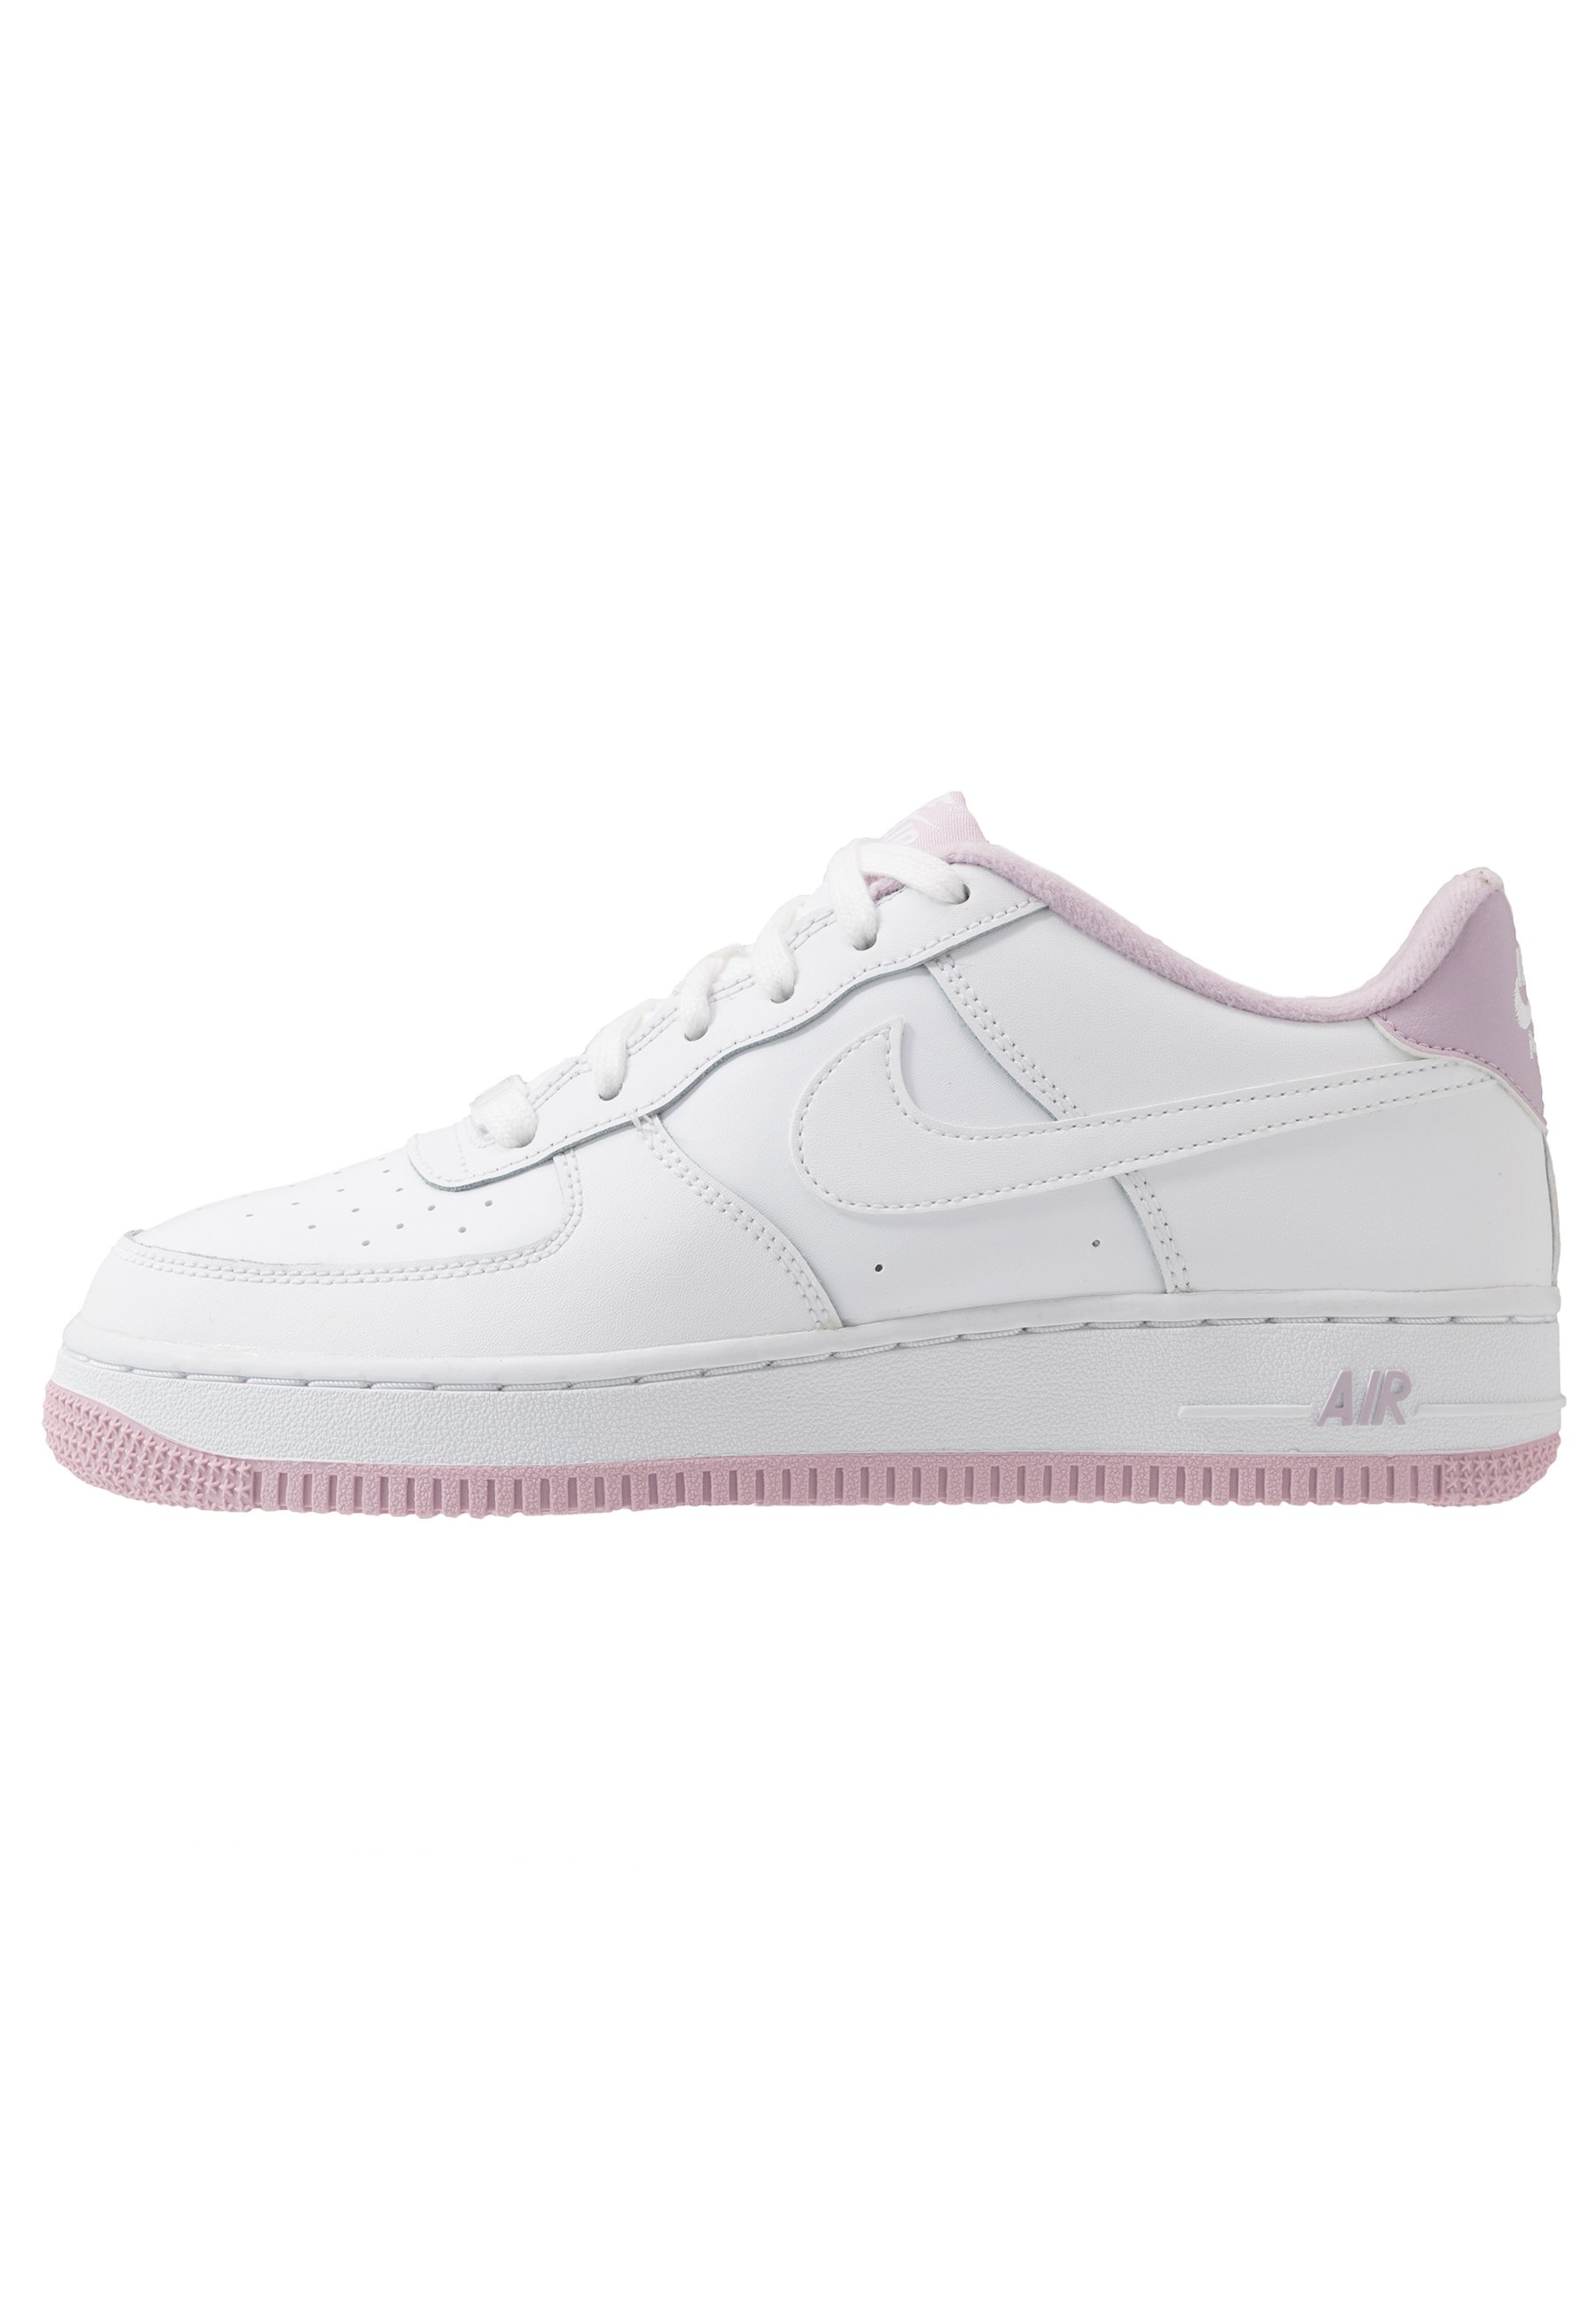 nike air force 1 gs sneakers basses femme